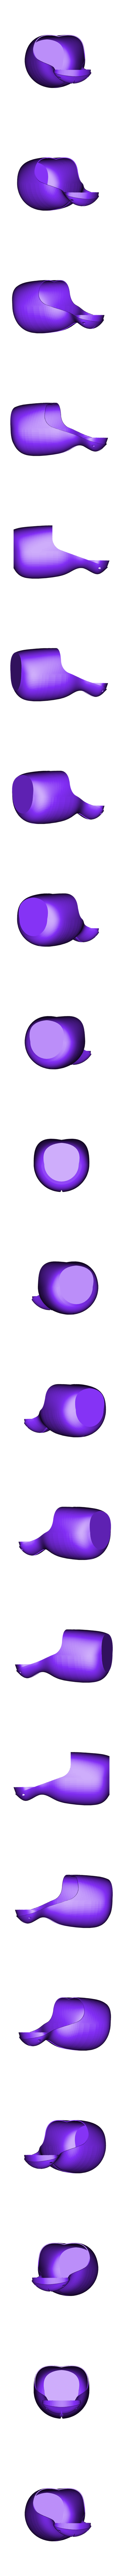 matriochka v3 b ovale.stl Télécharger fichier STL gratuit WHITE MATRIOCHKA • Design pour impression 3D, DJER